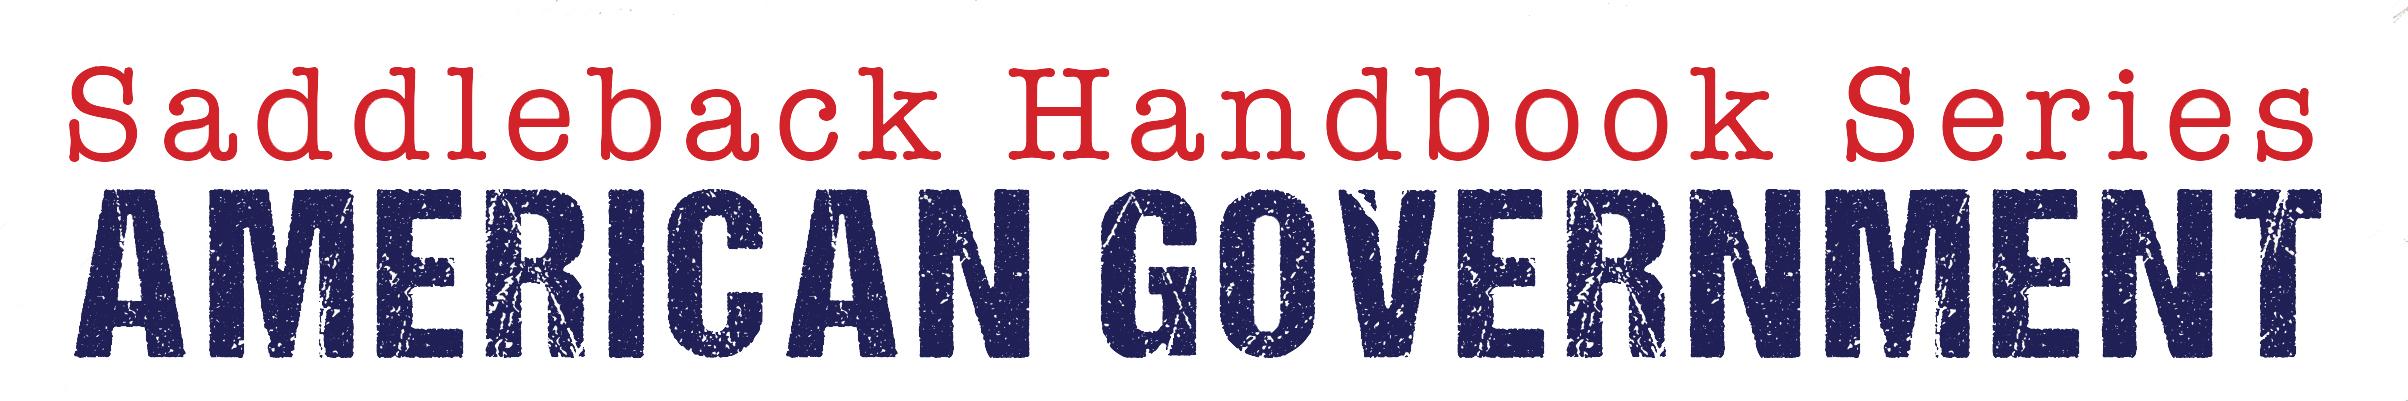 americangovernment-banner-white.jpg